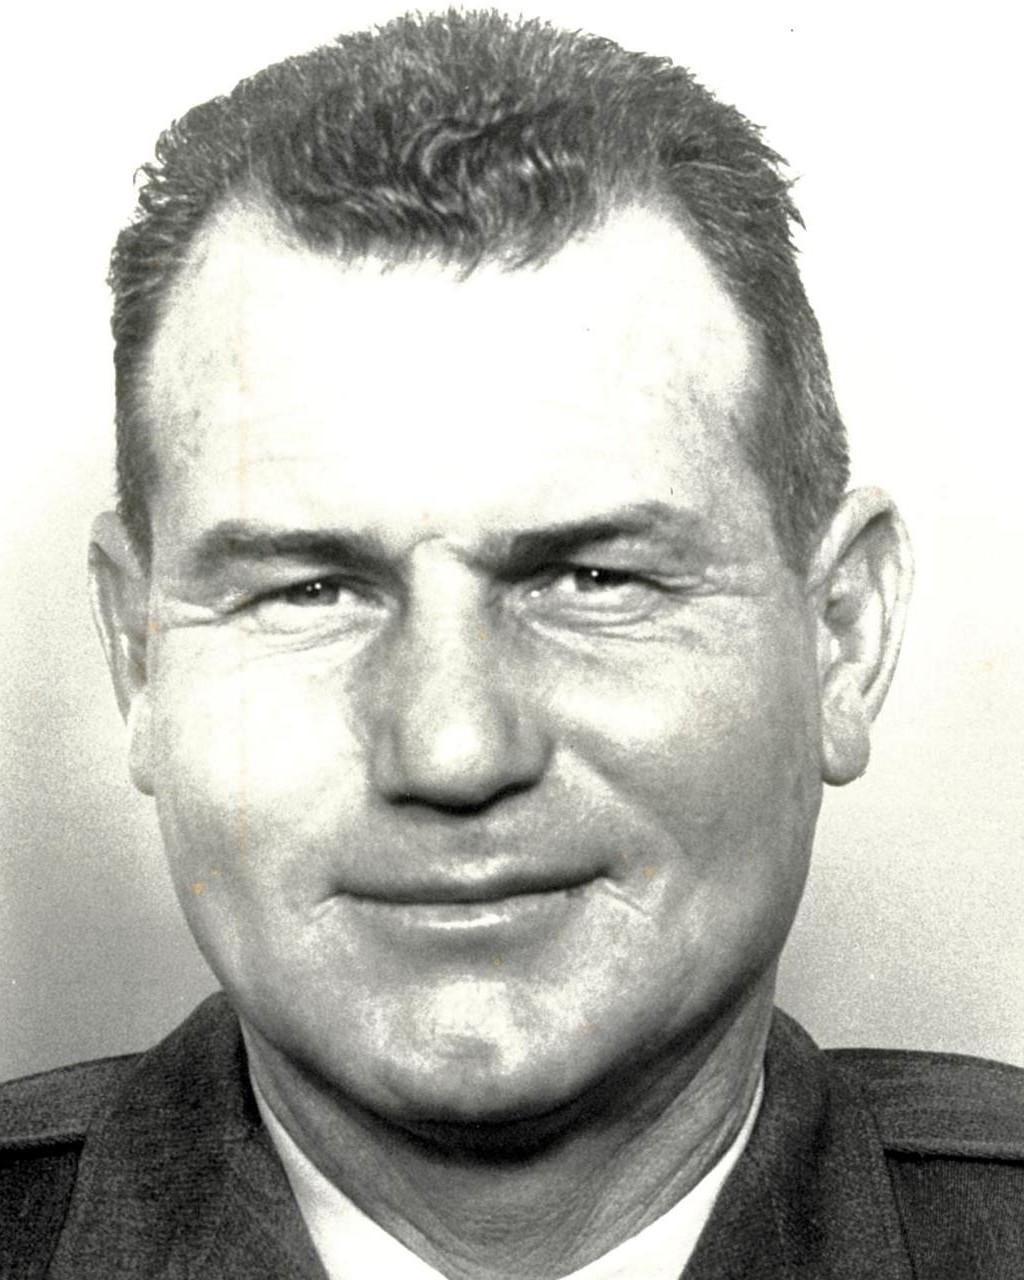 Officer Robert J. Furmage, Jr.   North Carolina Division of Motor Vehicles Enforcement Section, North Carolina